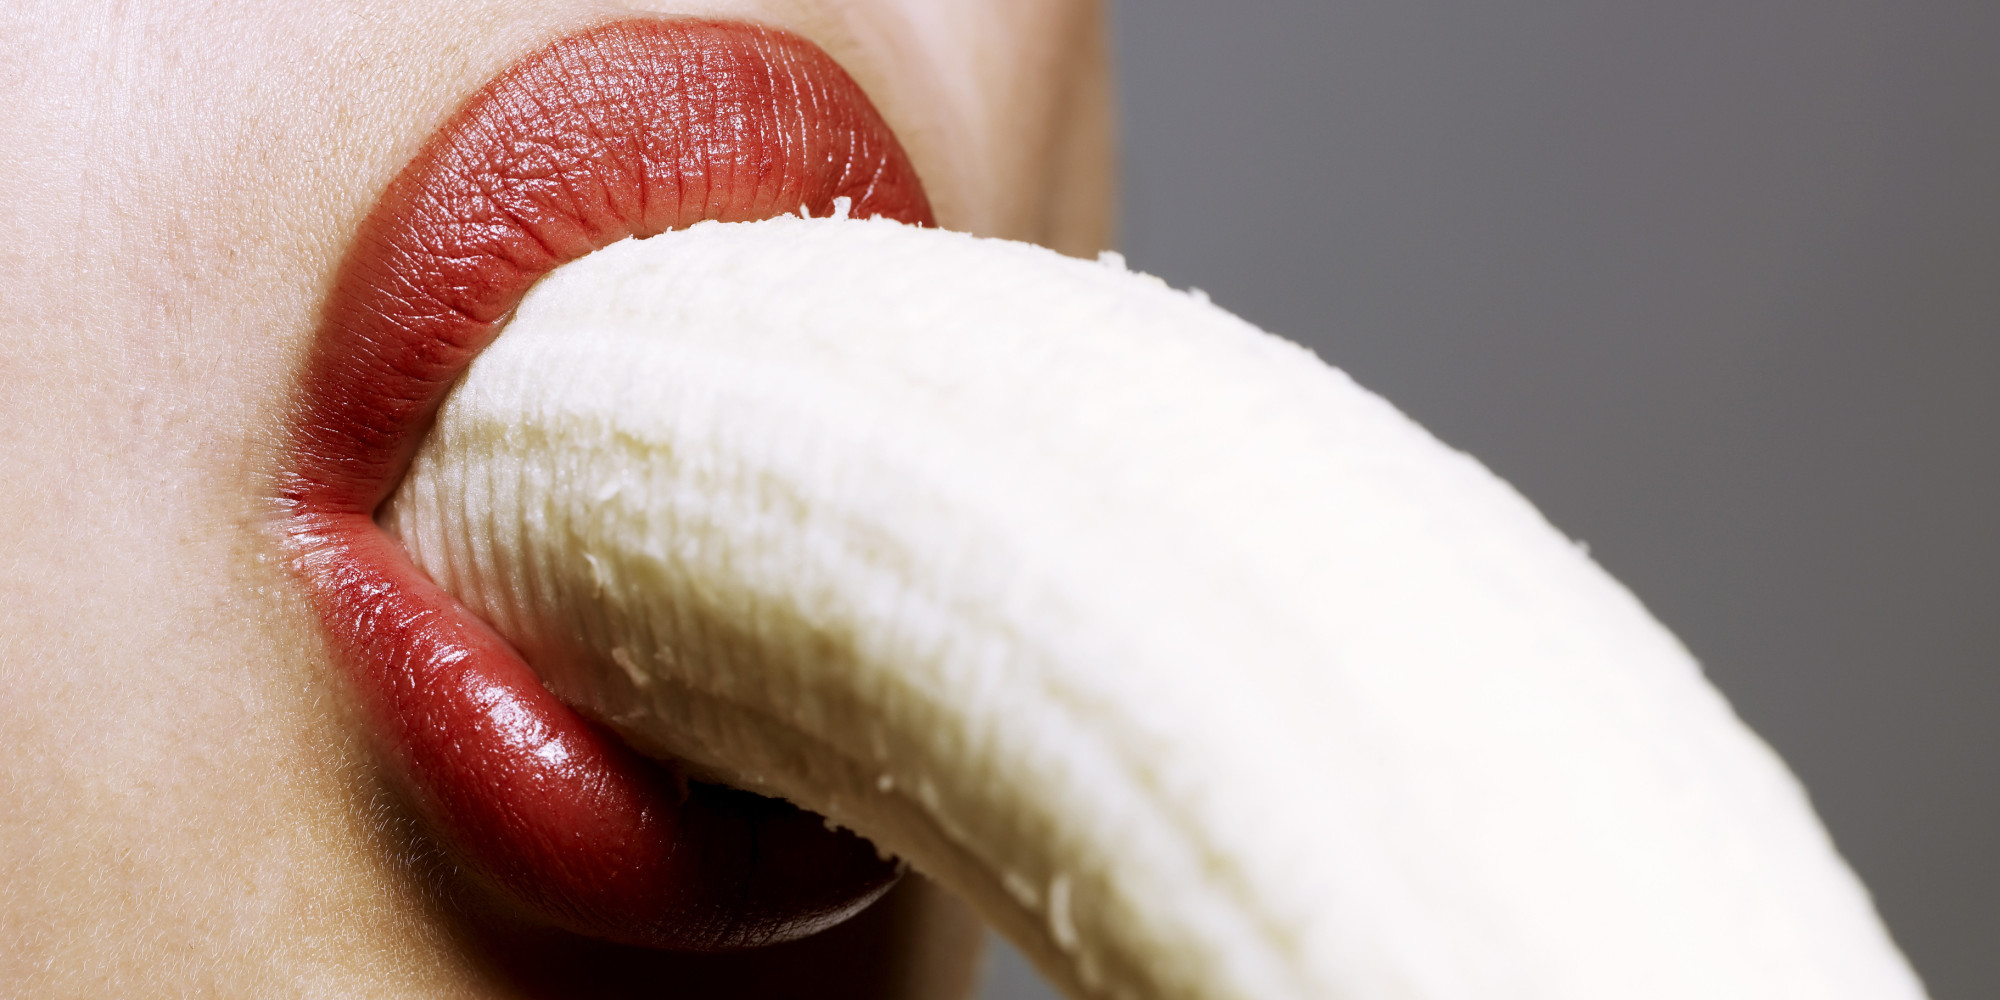 Can fingernail fungus transfer to vagina